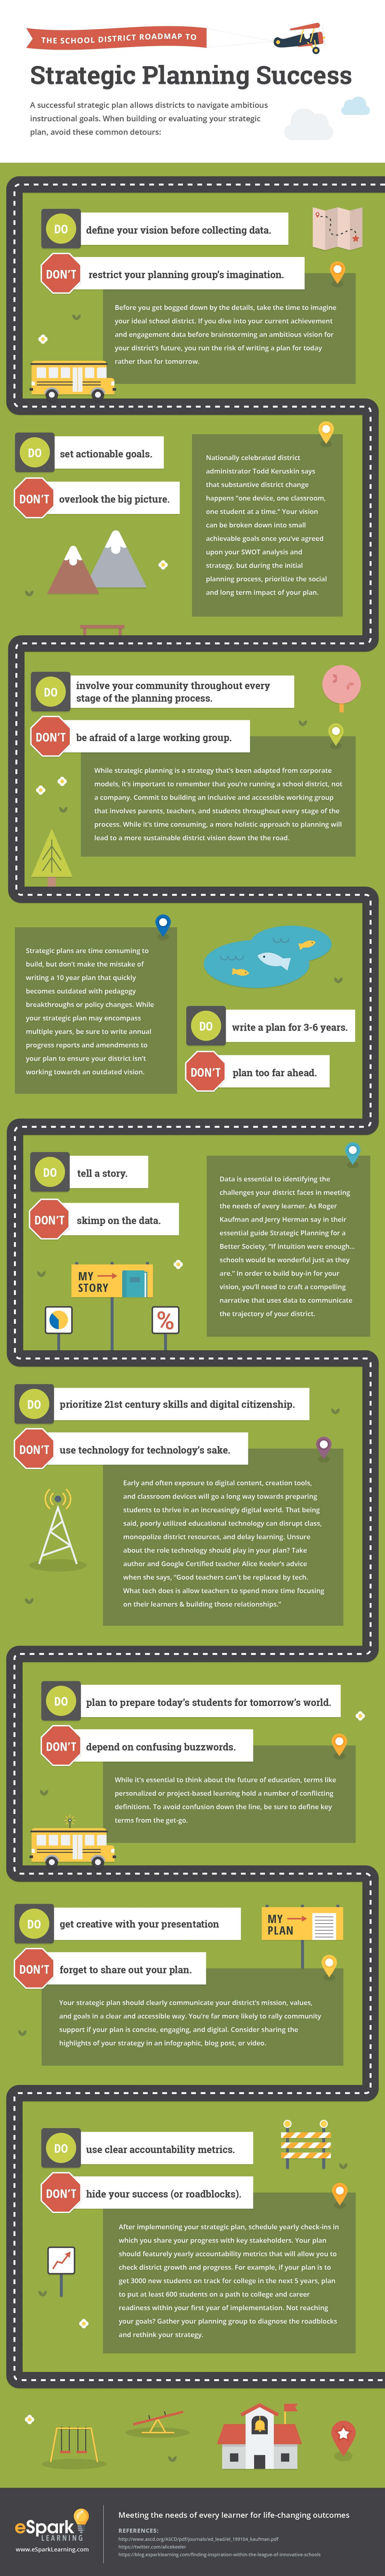 Strategic Planning Infographic